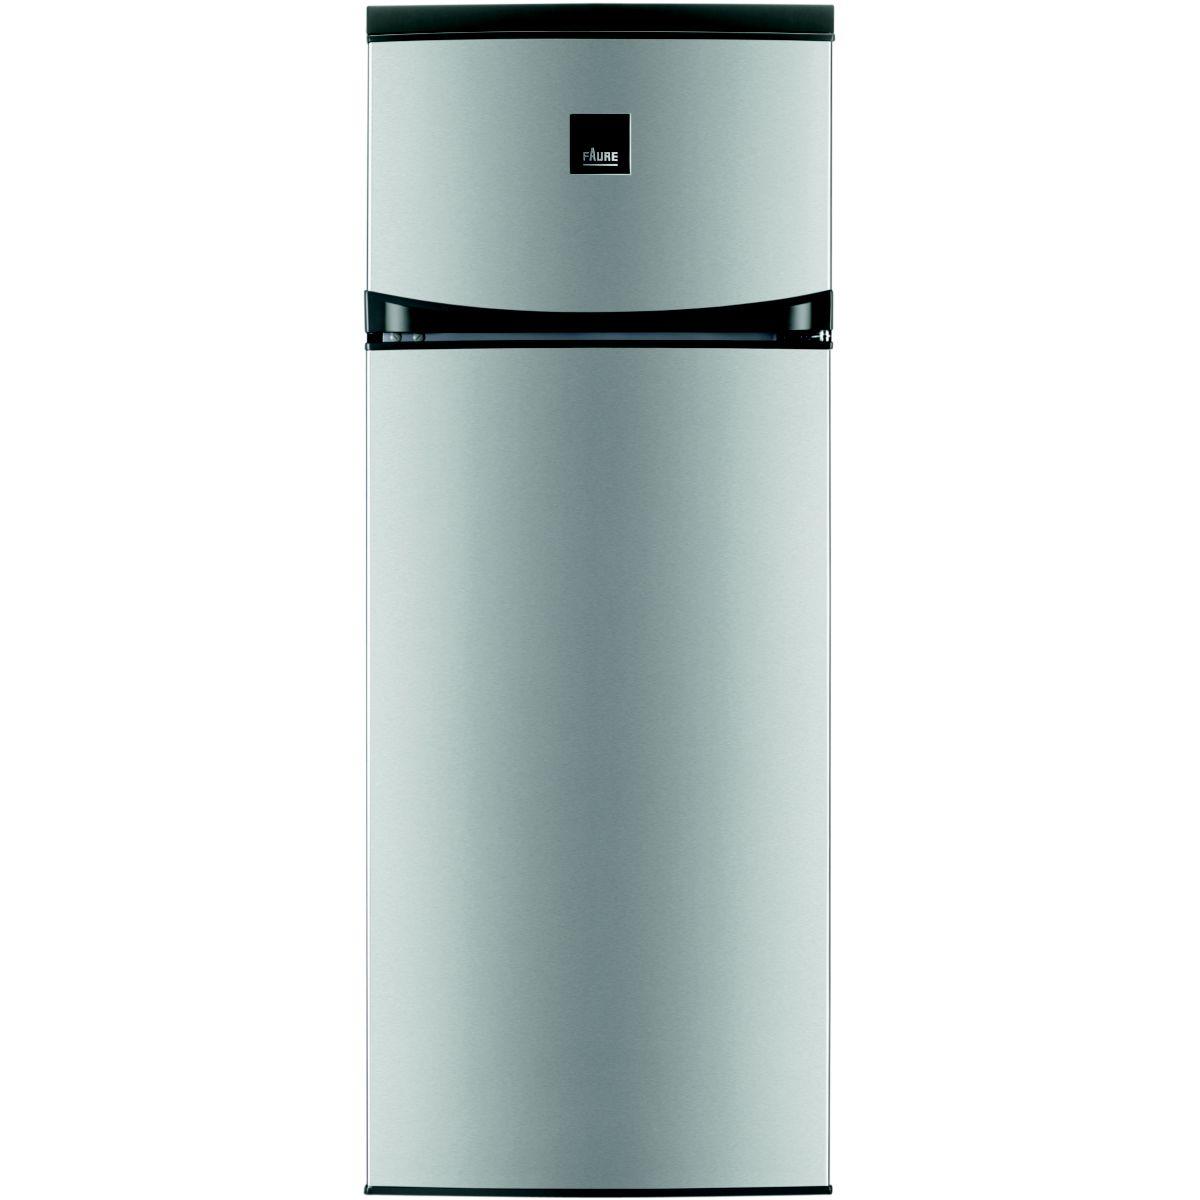 Réfrigérateur 2 Portes FAURE FRT23101XA (photo)